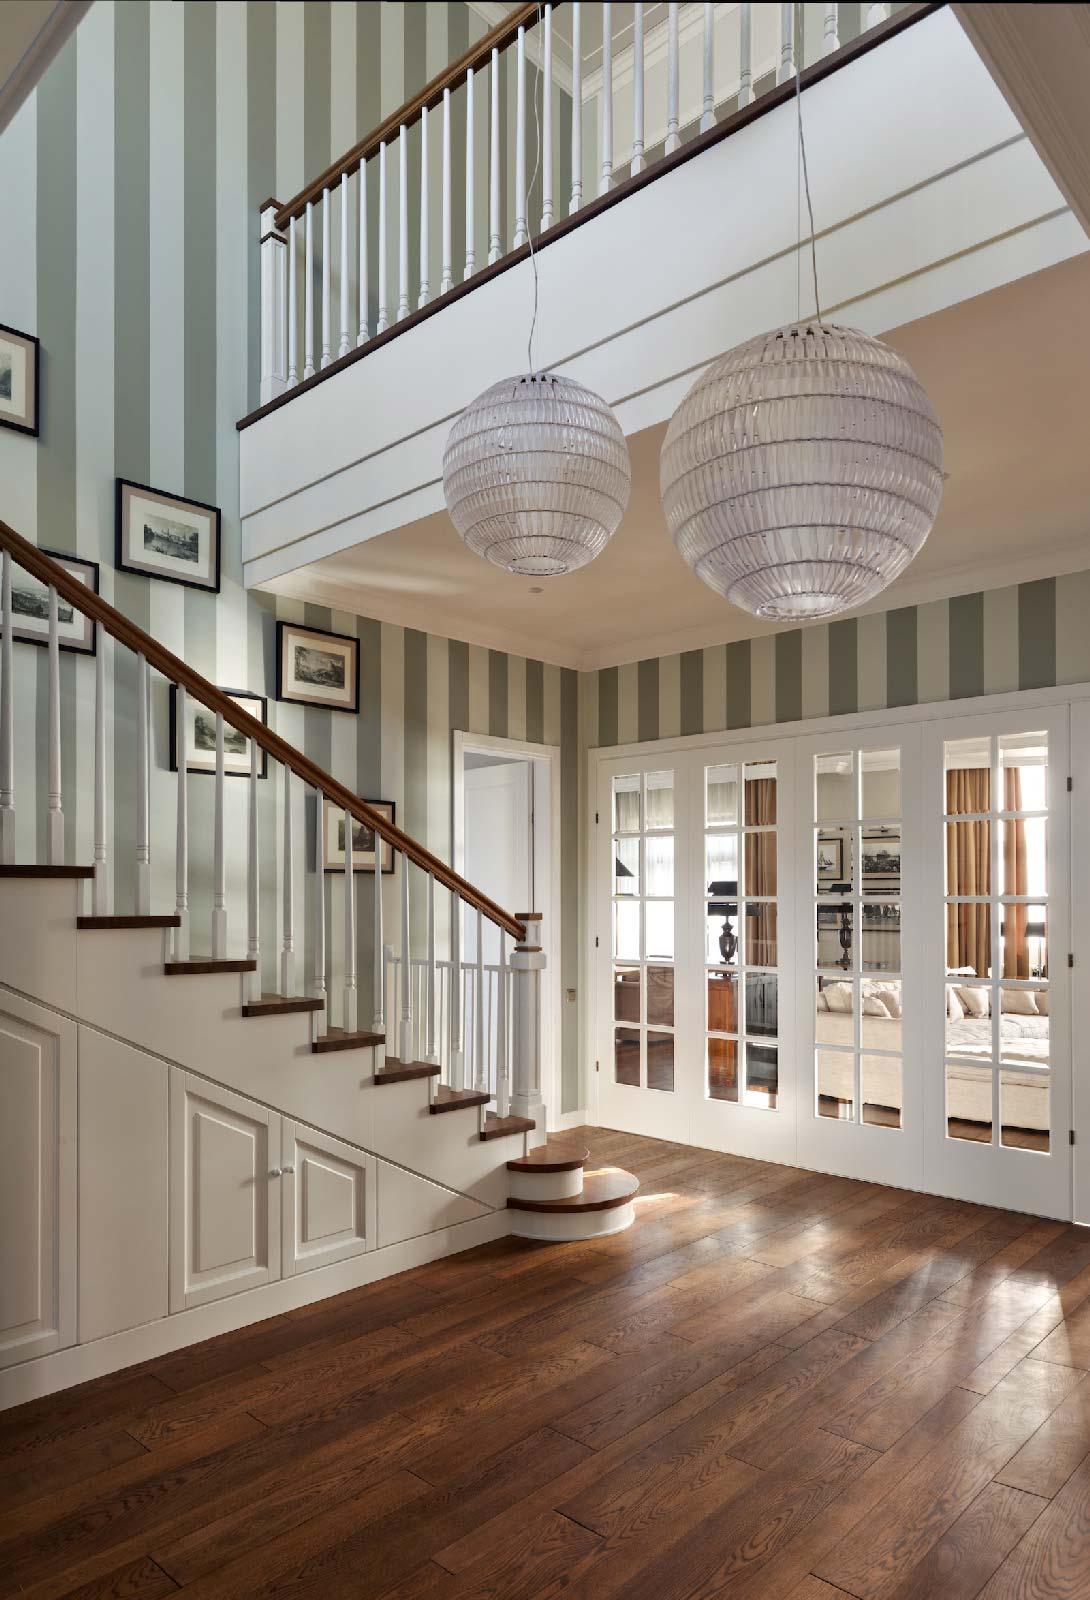 Porte Interne Usate Bianche porte in stile inglese per una casa new classic | garofoli